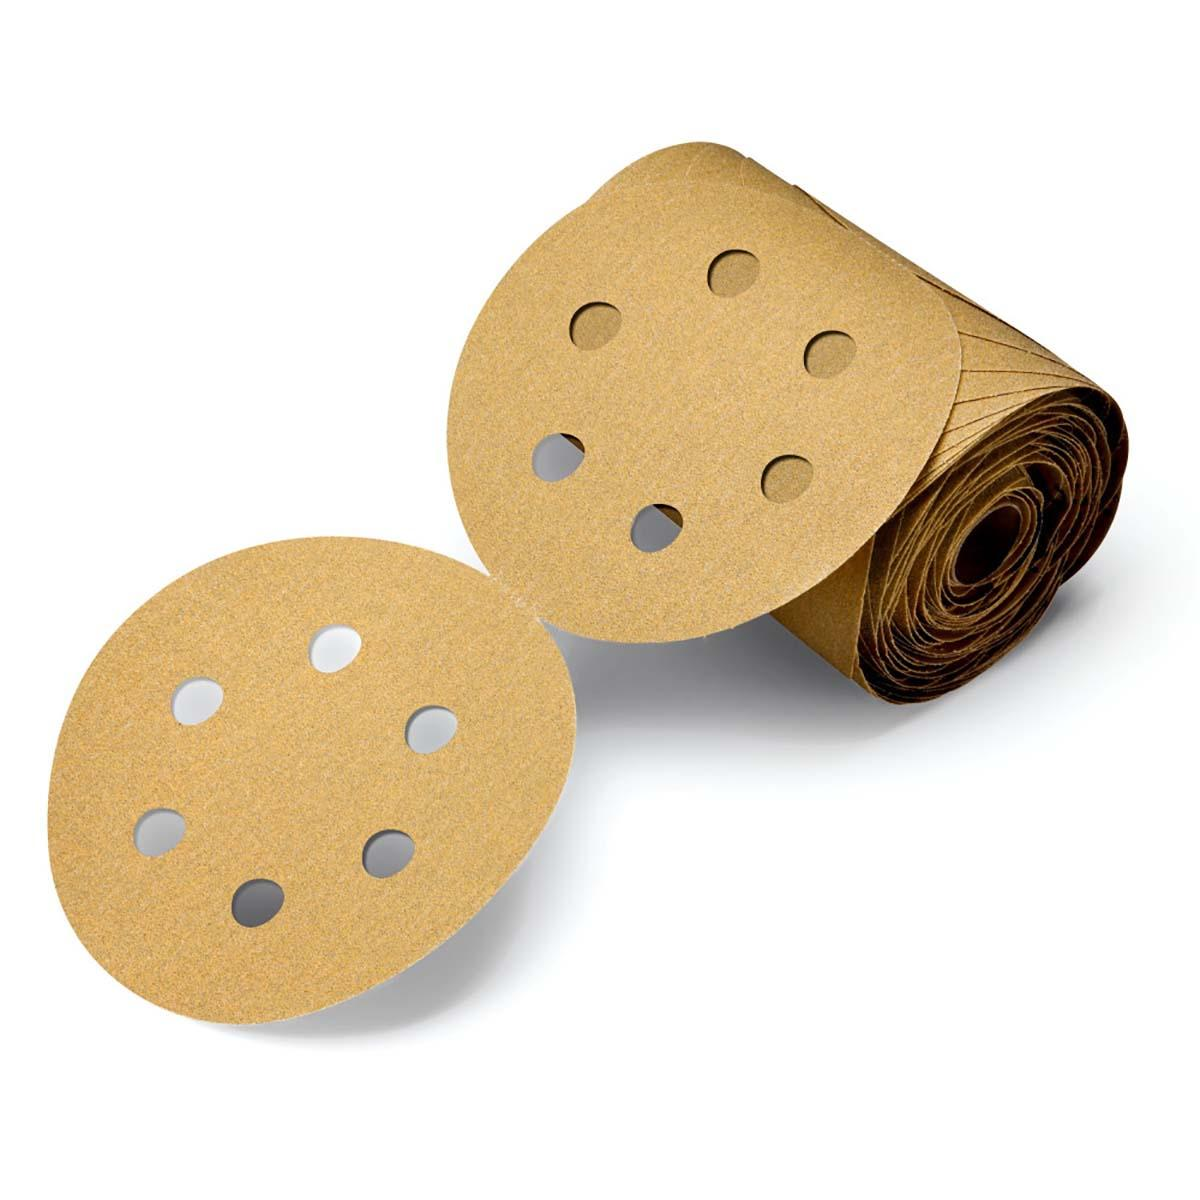 Manual Sanding Products 100 Discs per Roll 3M Stikit Film Disc ...